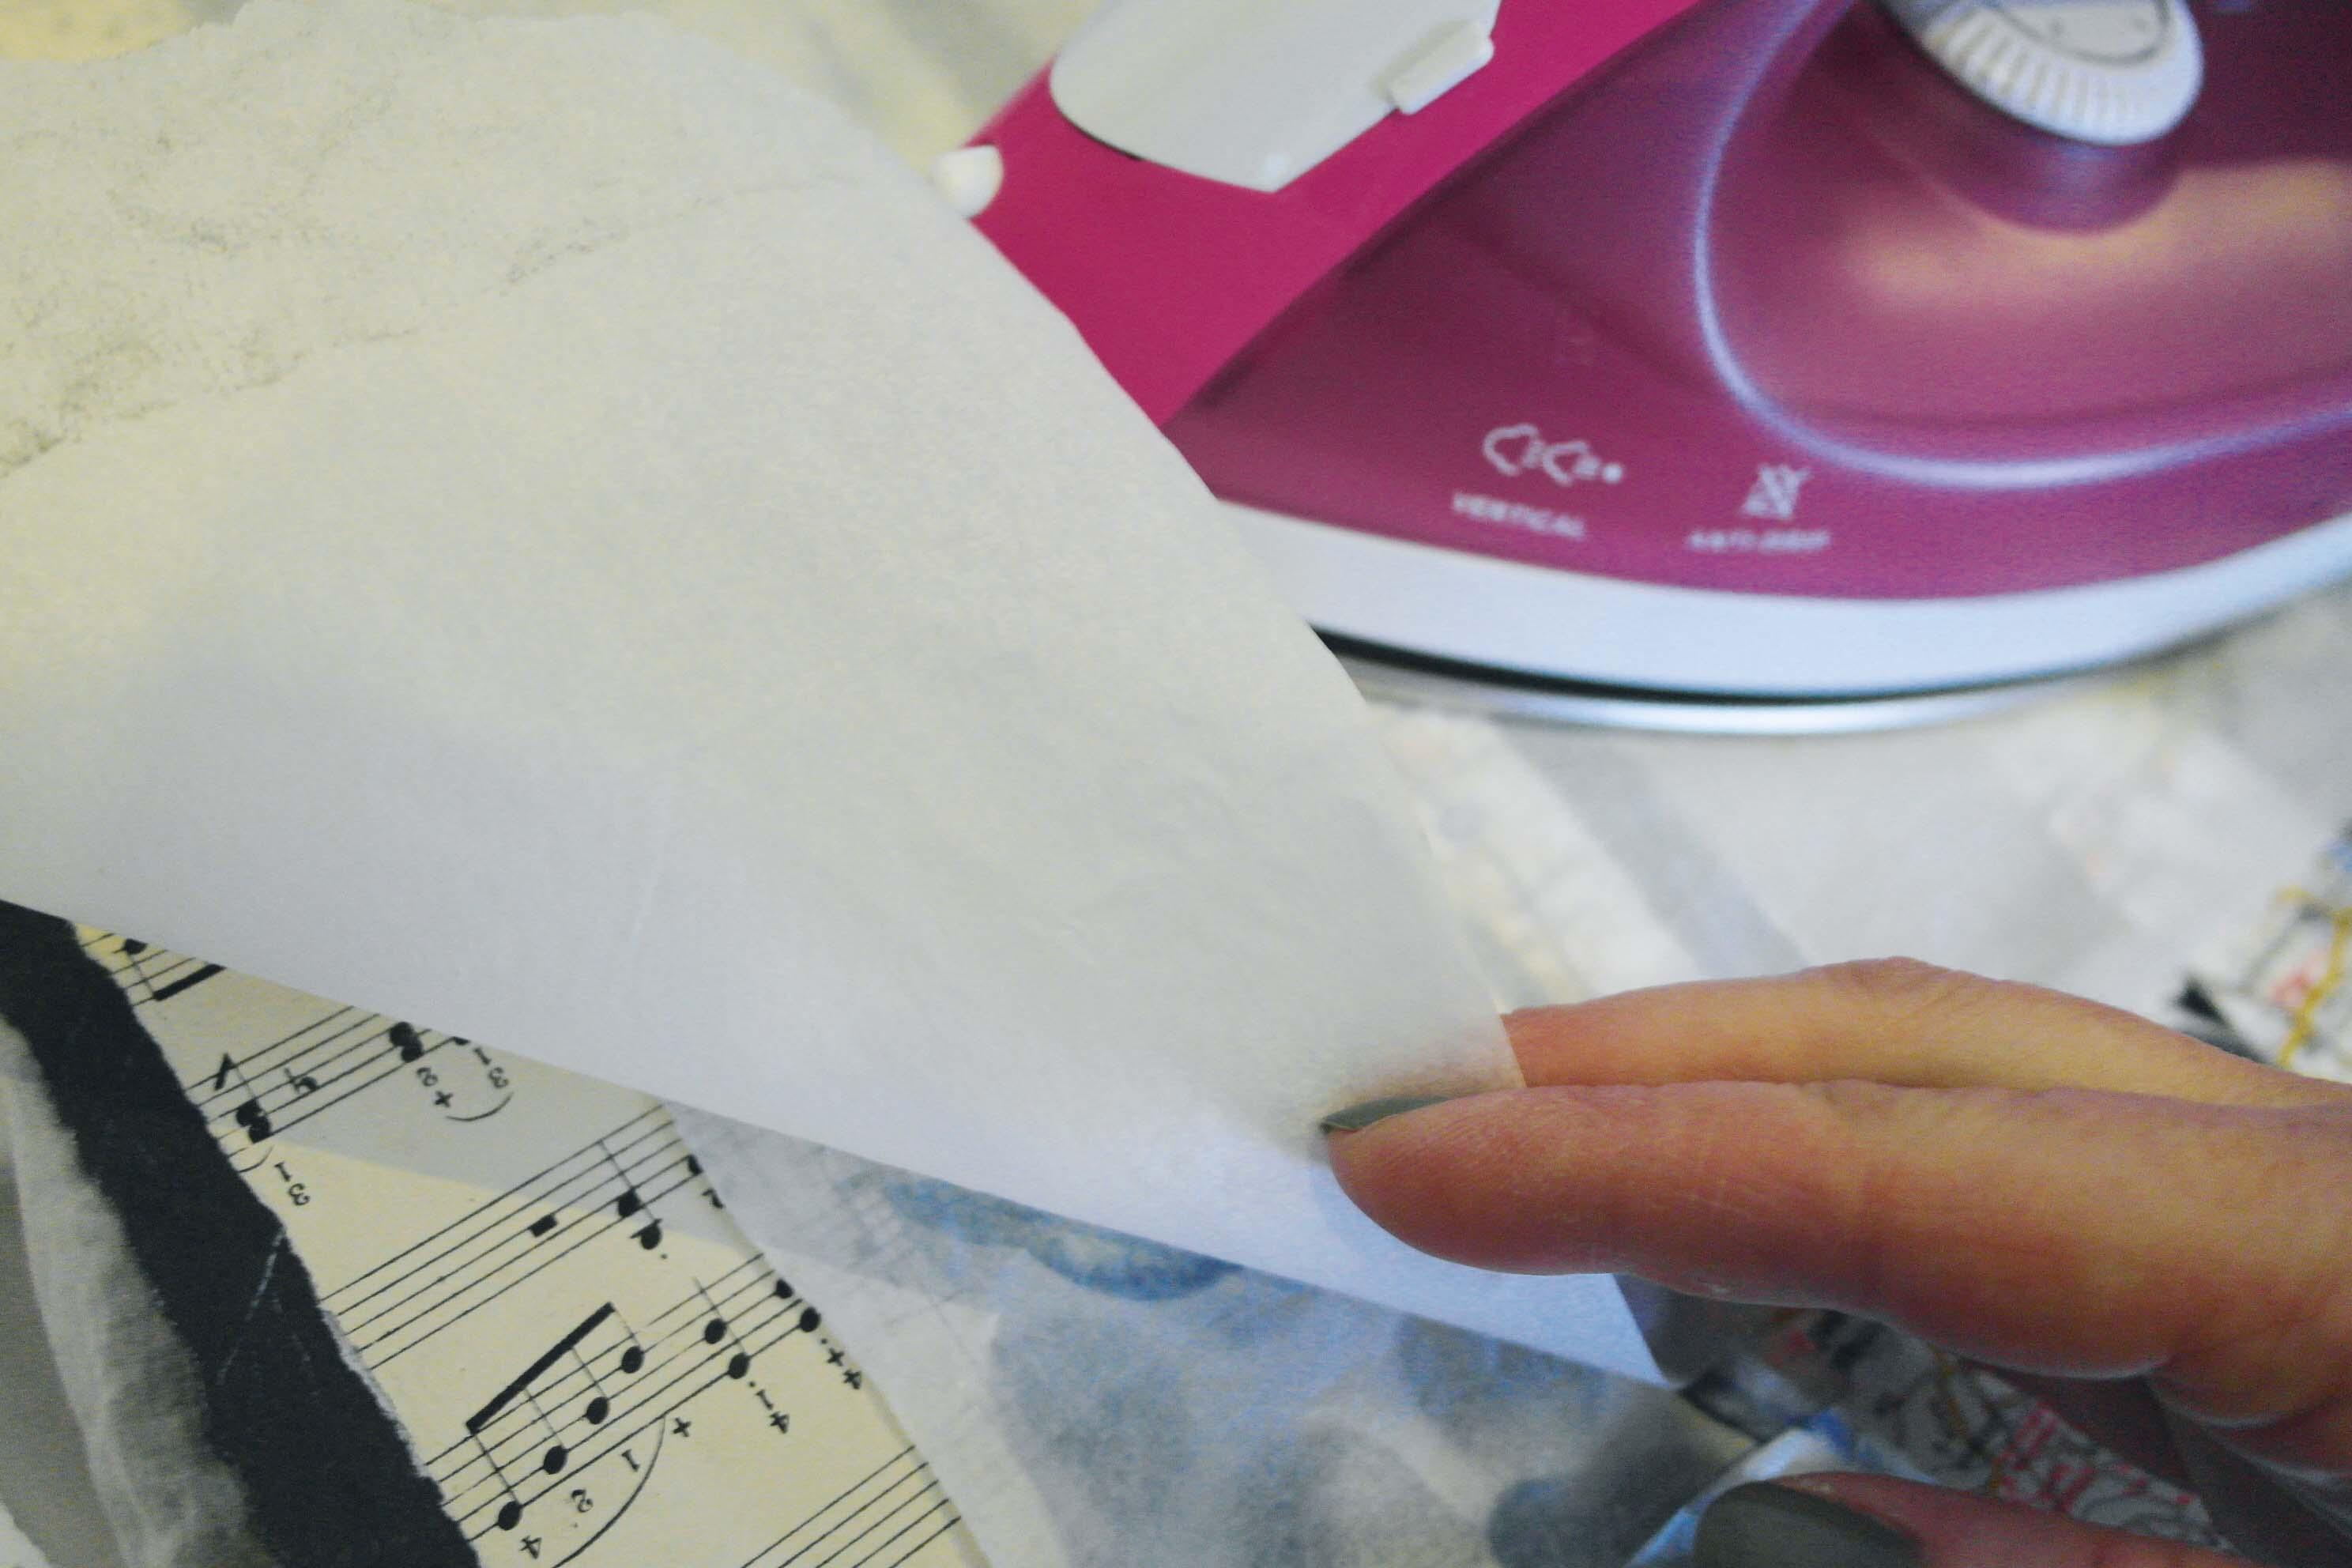 Ironing on the interfacing